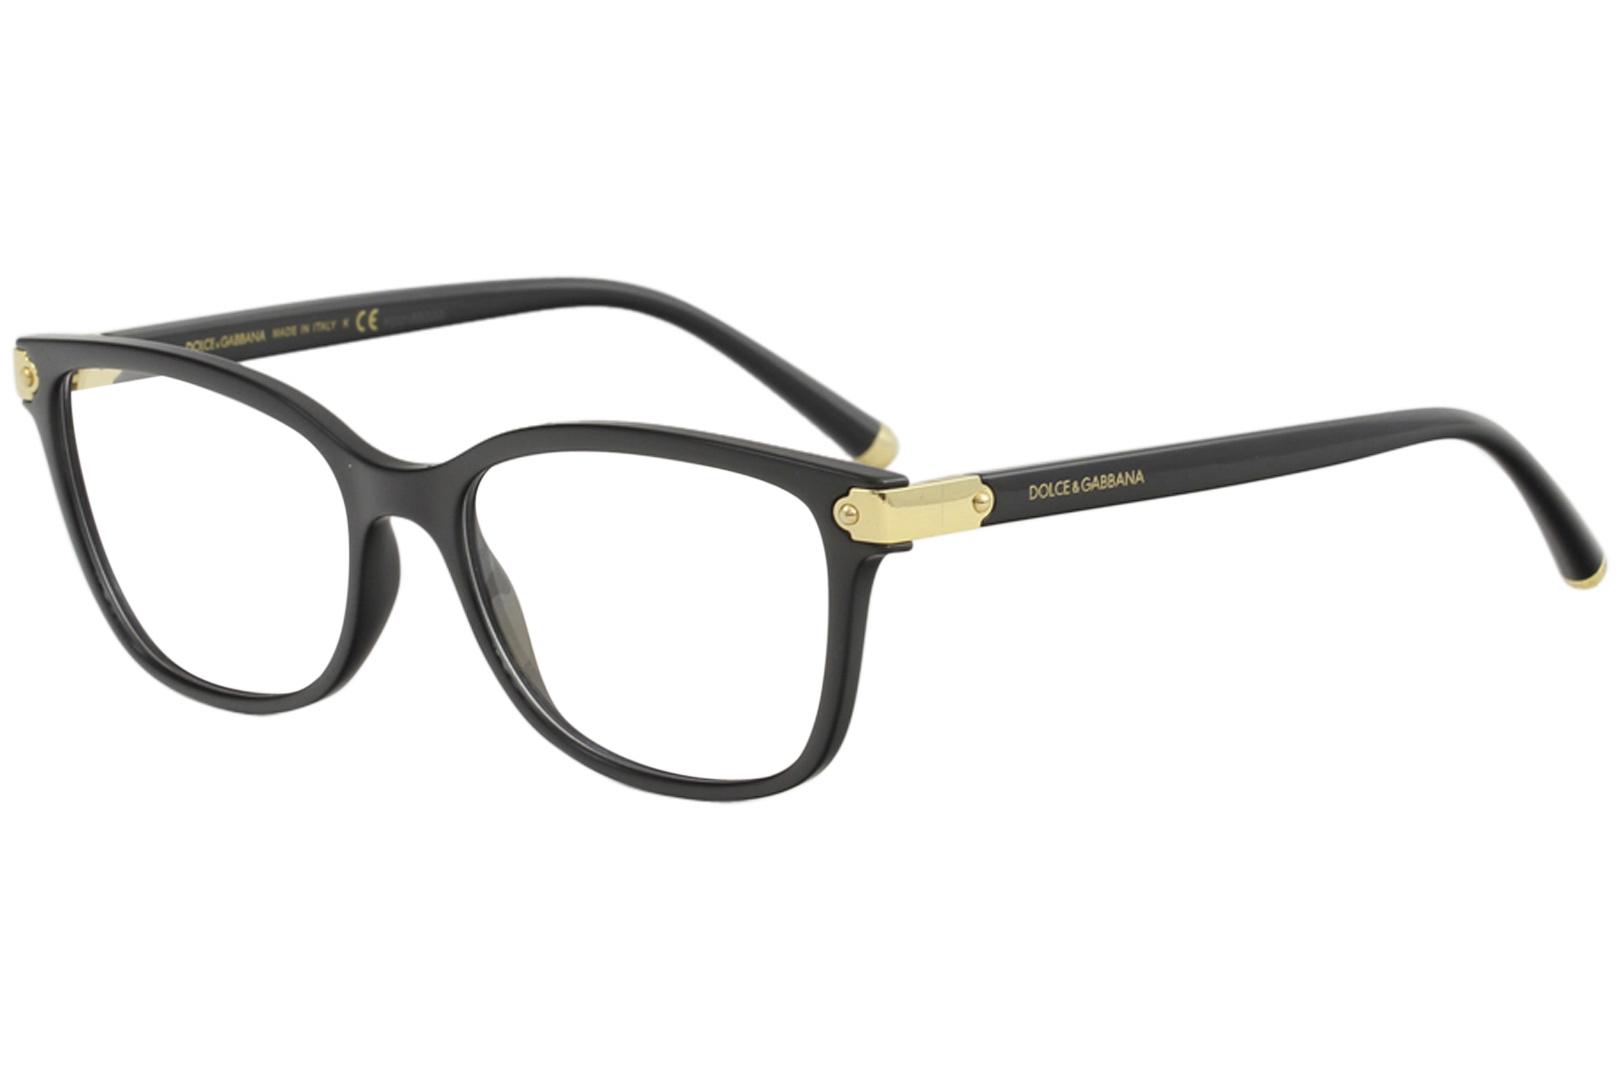 370db30fc4 Dolce   Gabbana Eyeglasses D G DG5036 DG 5036 501 Black Gold Optical ...